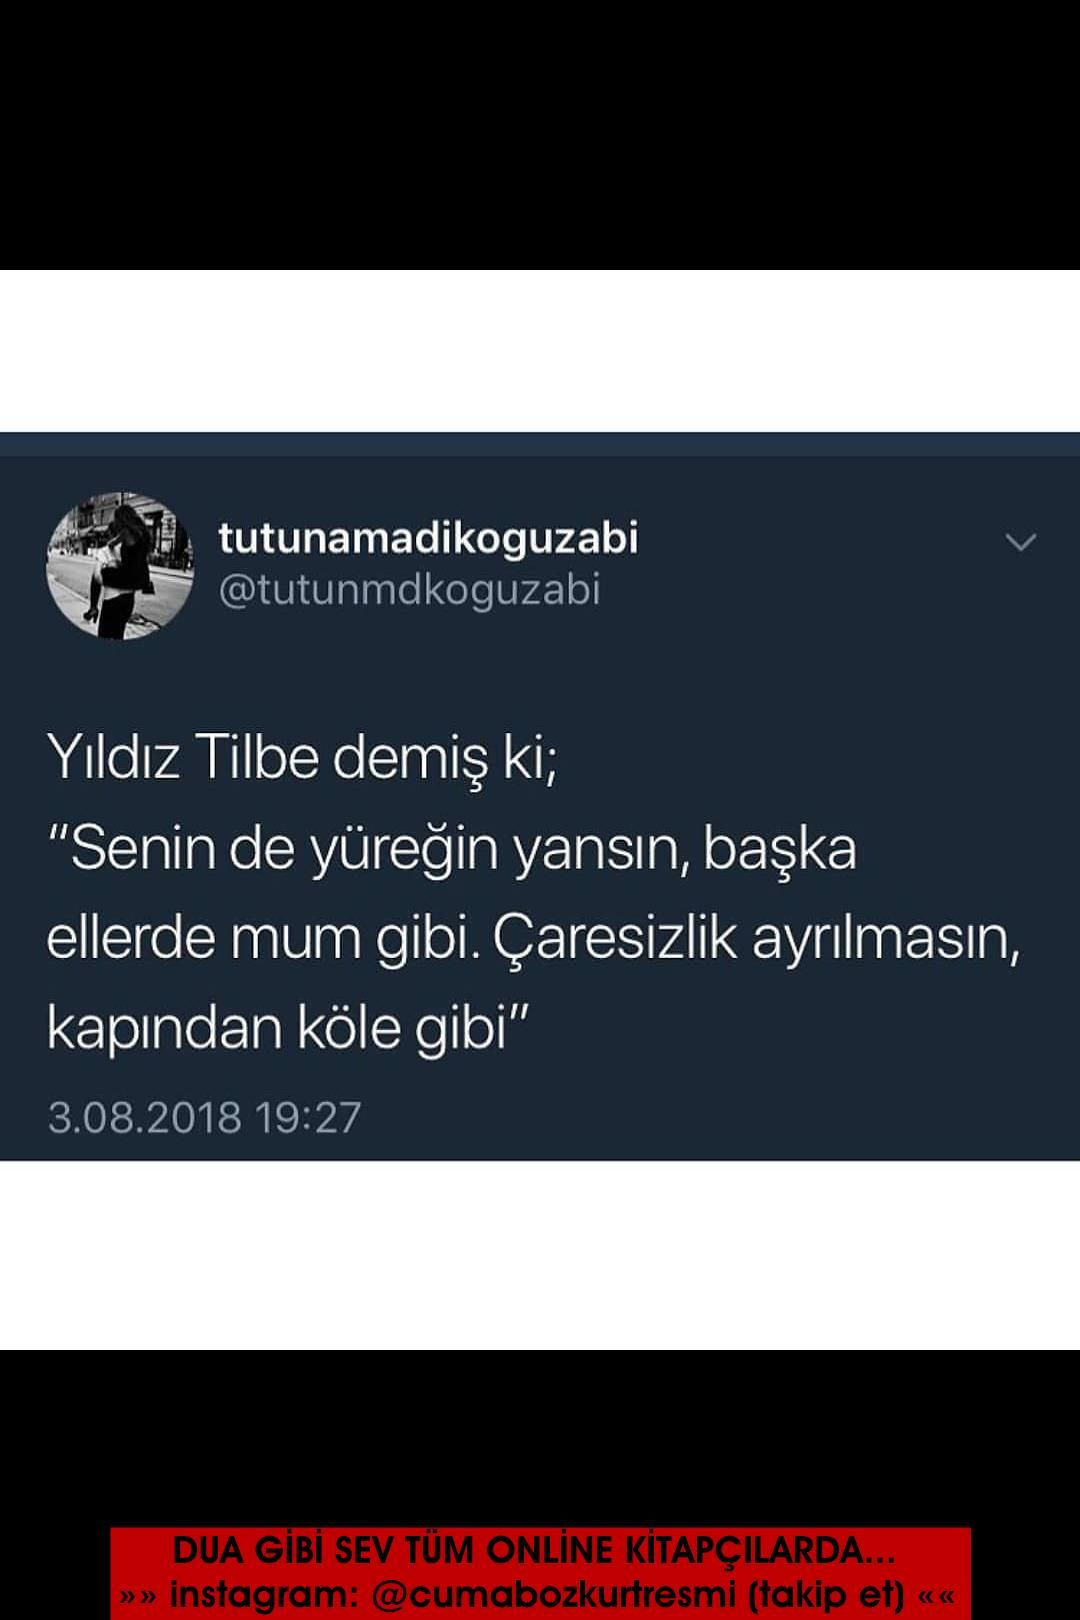 Manali Kisa Guzel Sozler Guzel Soz Instagram Dualar